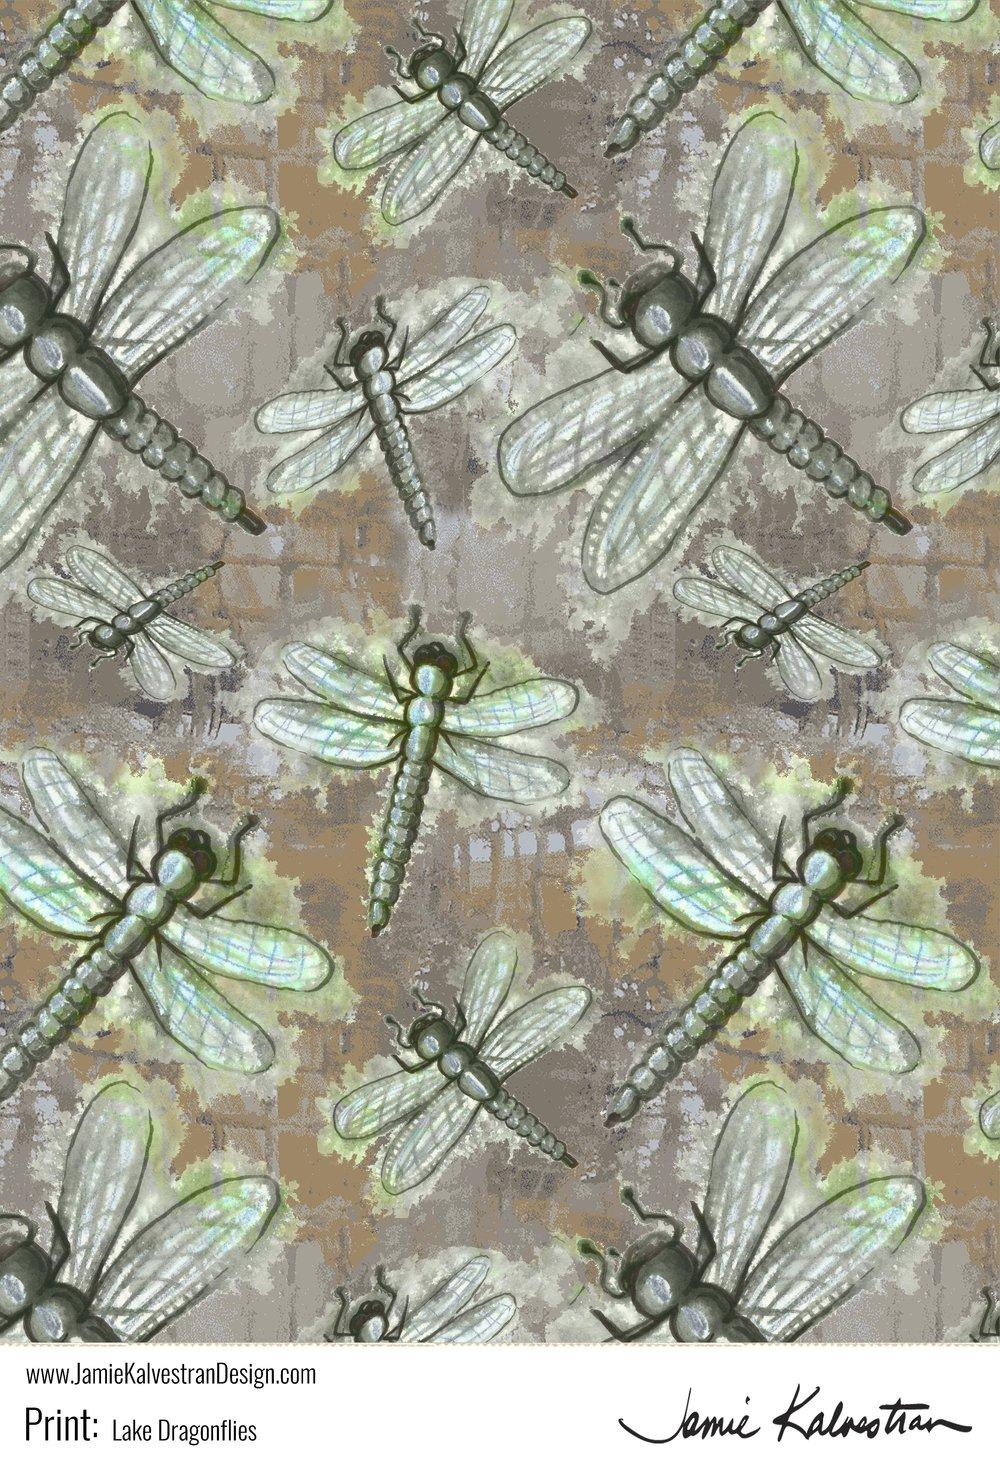 Jamie_Kalvestran_Lake_Dragonflies.jpg